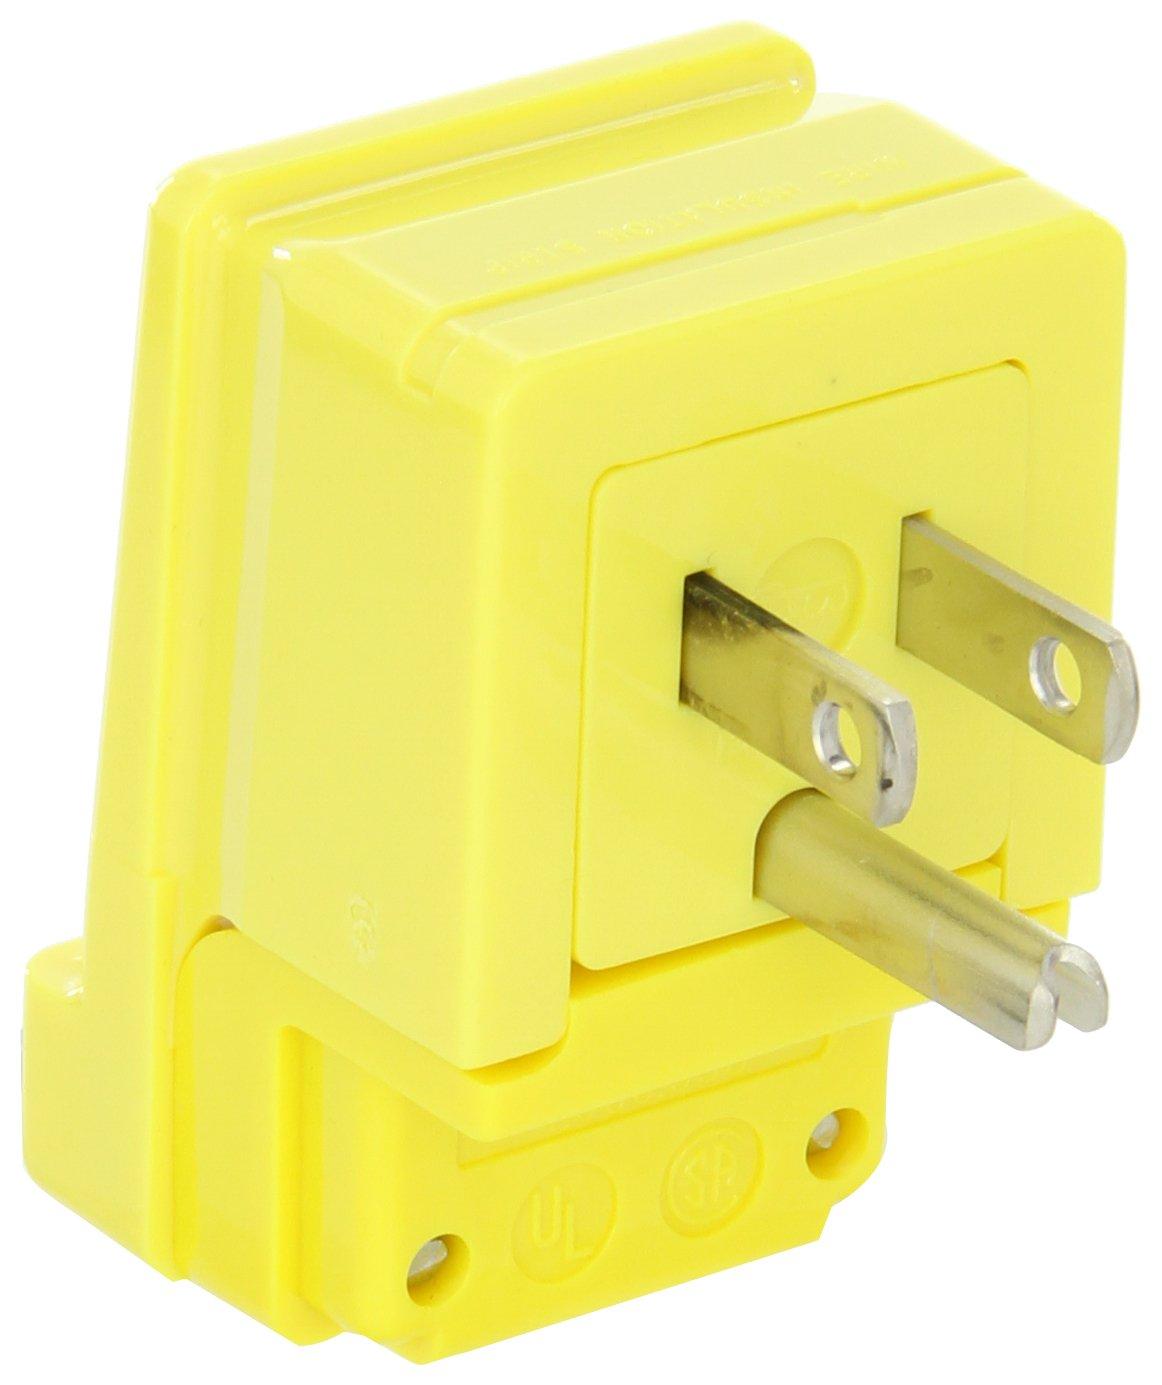 Leviton 6594 15 Amp 125 Volt Plug Straight Blade Gfci Ground Wiring Instructions